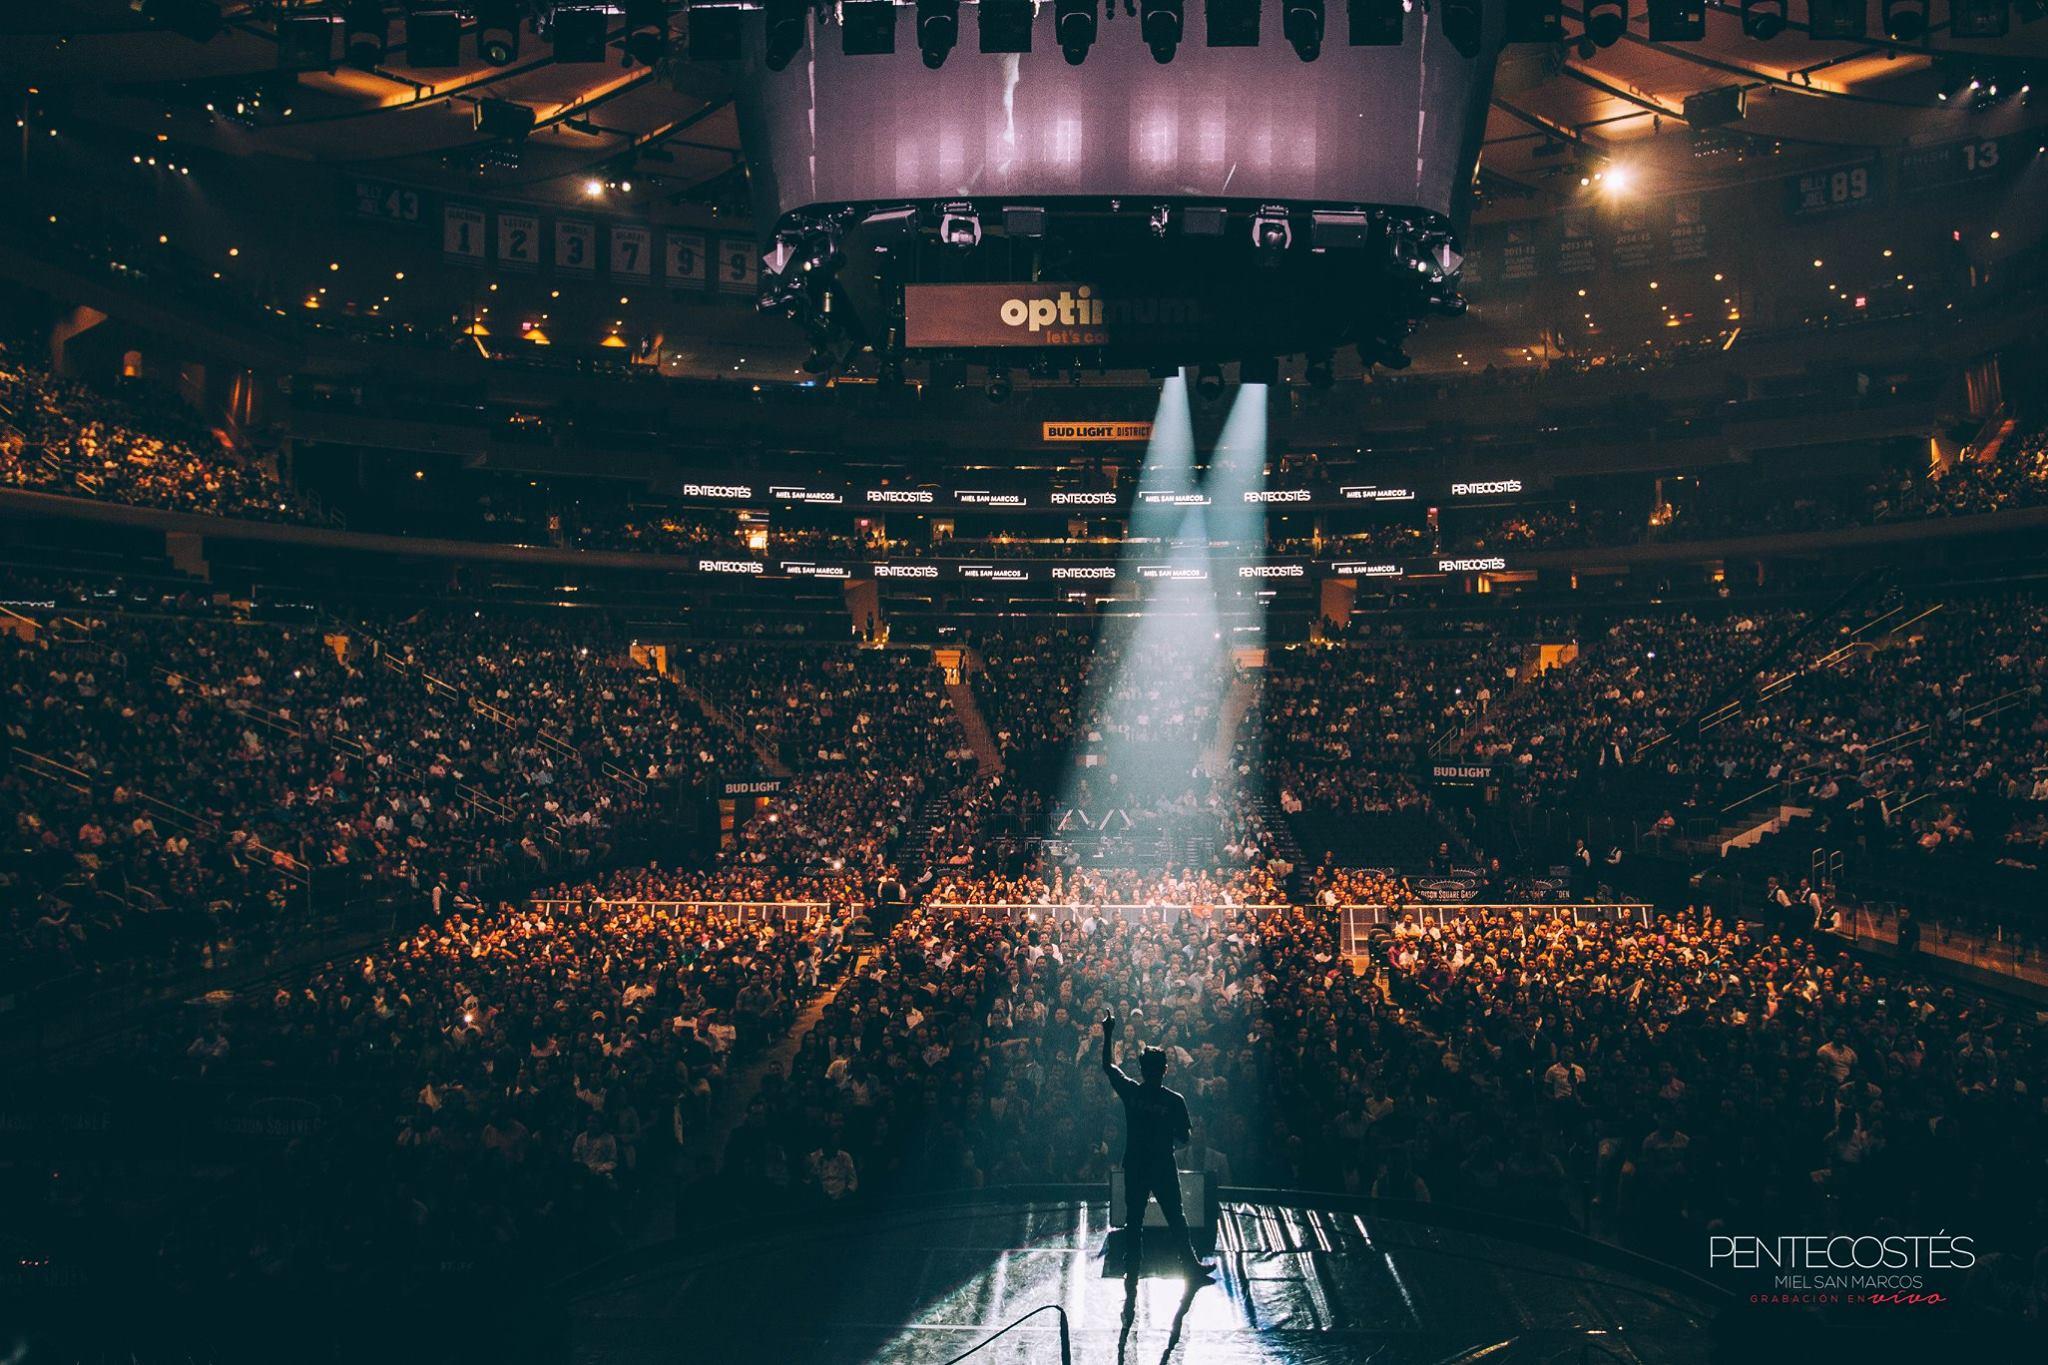 Gape En La Radio Tv Miel San Marcos Hizo Historia En El Madison Square Garden